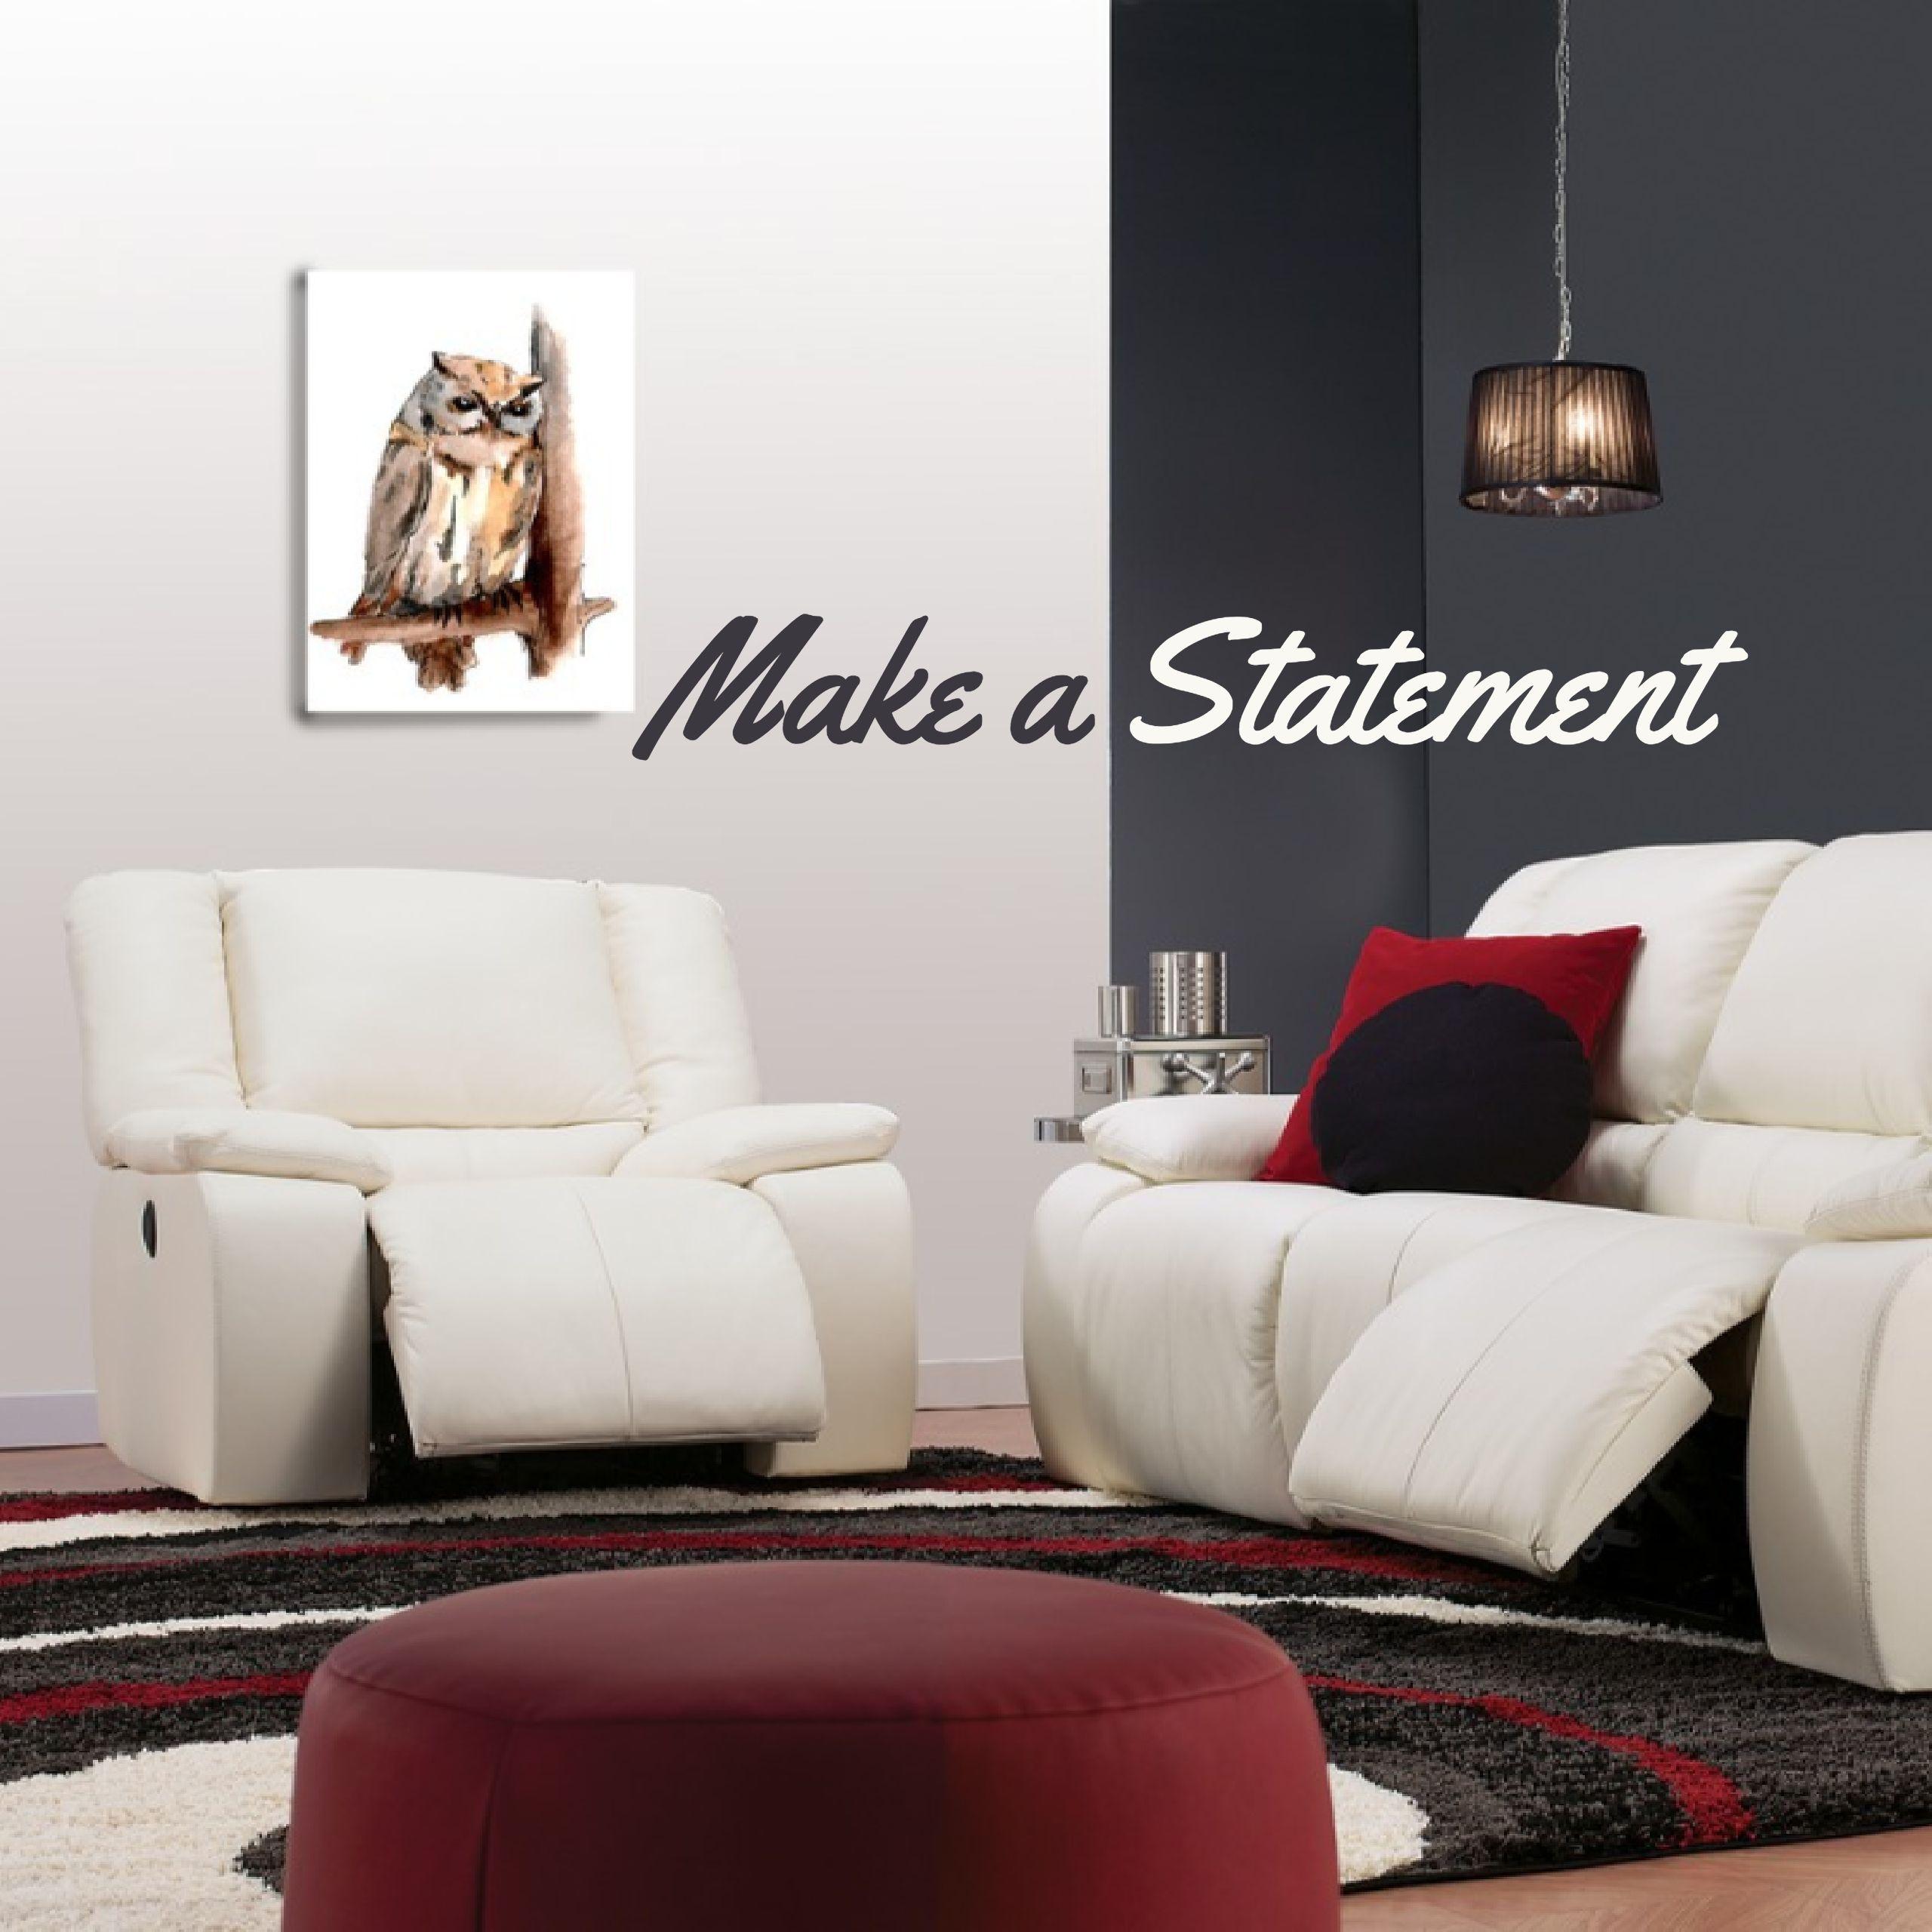 Our Harrow sofa in a Tulsa II Chalk provides sleekness and